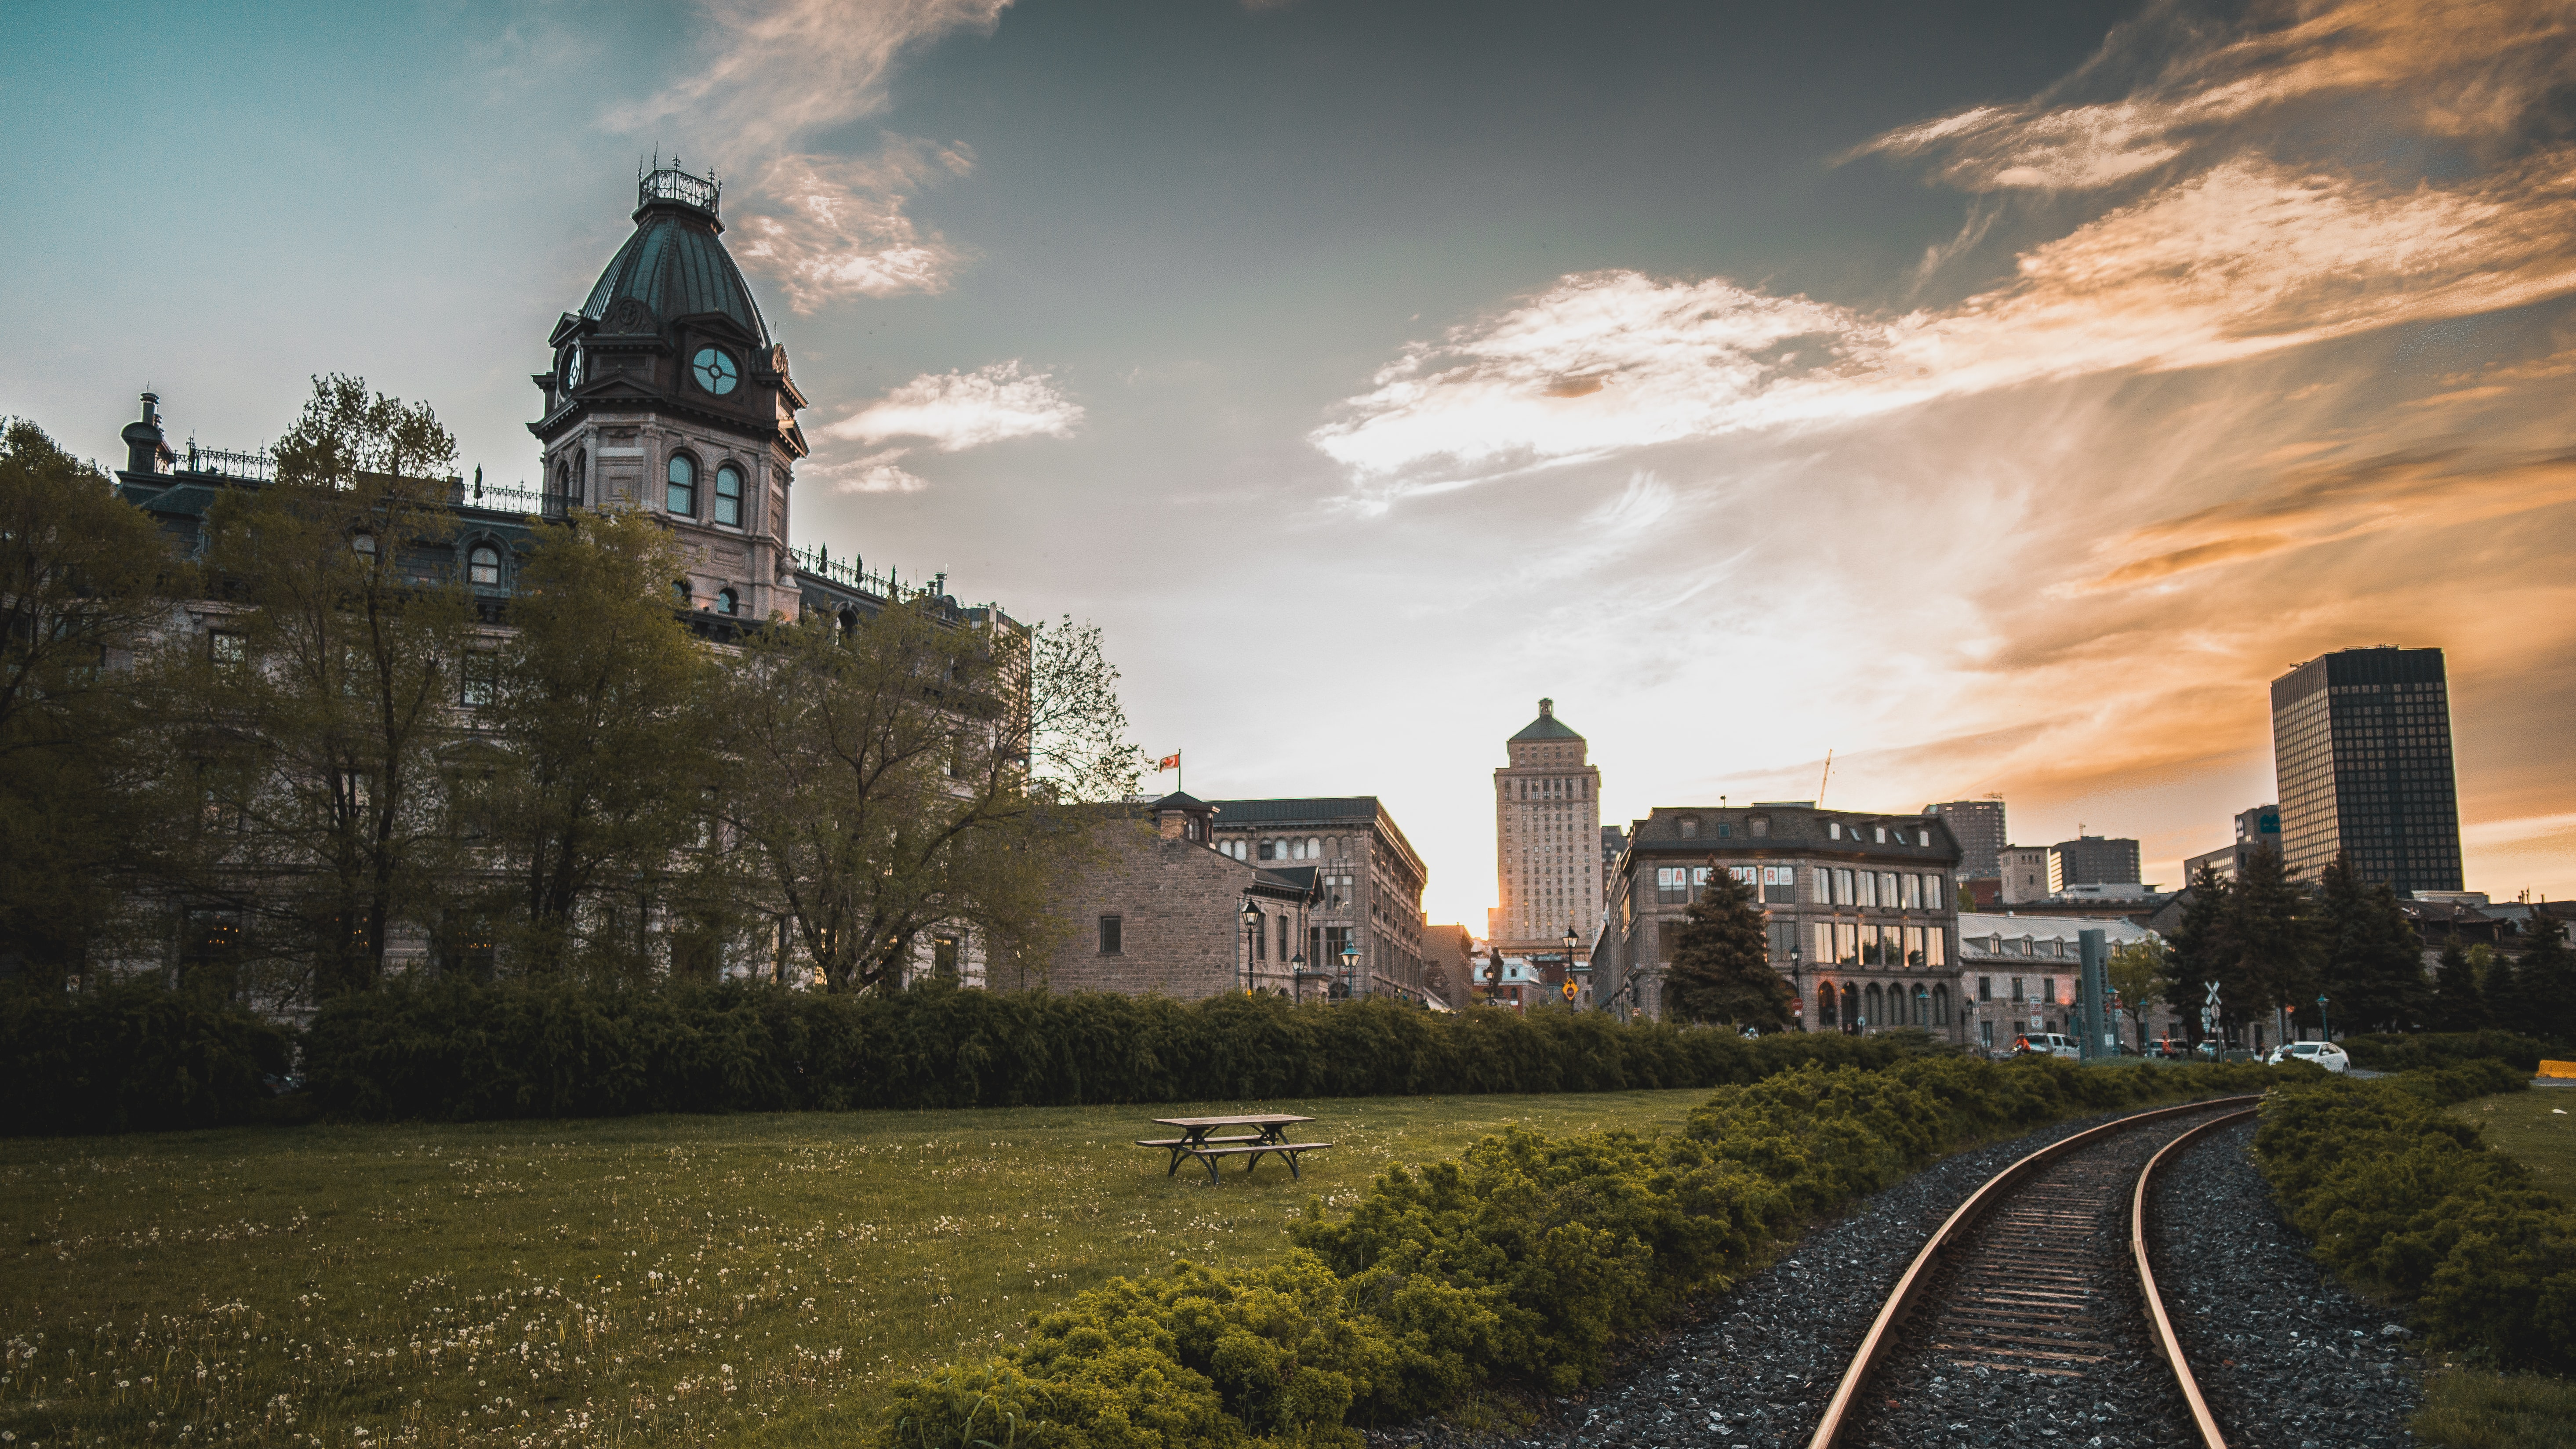 train rail near concrete houses during daytime